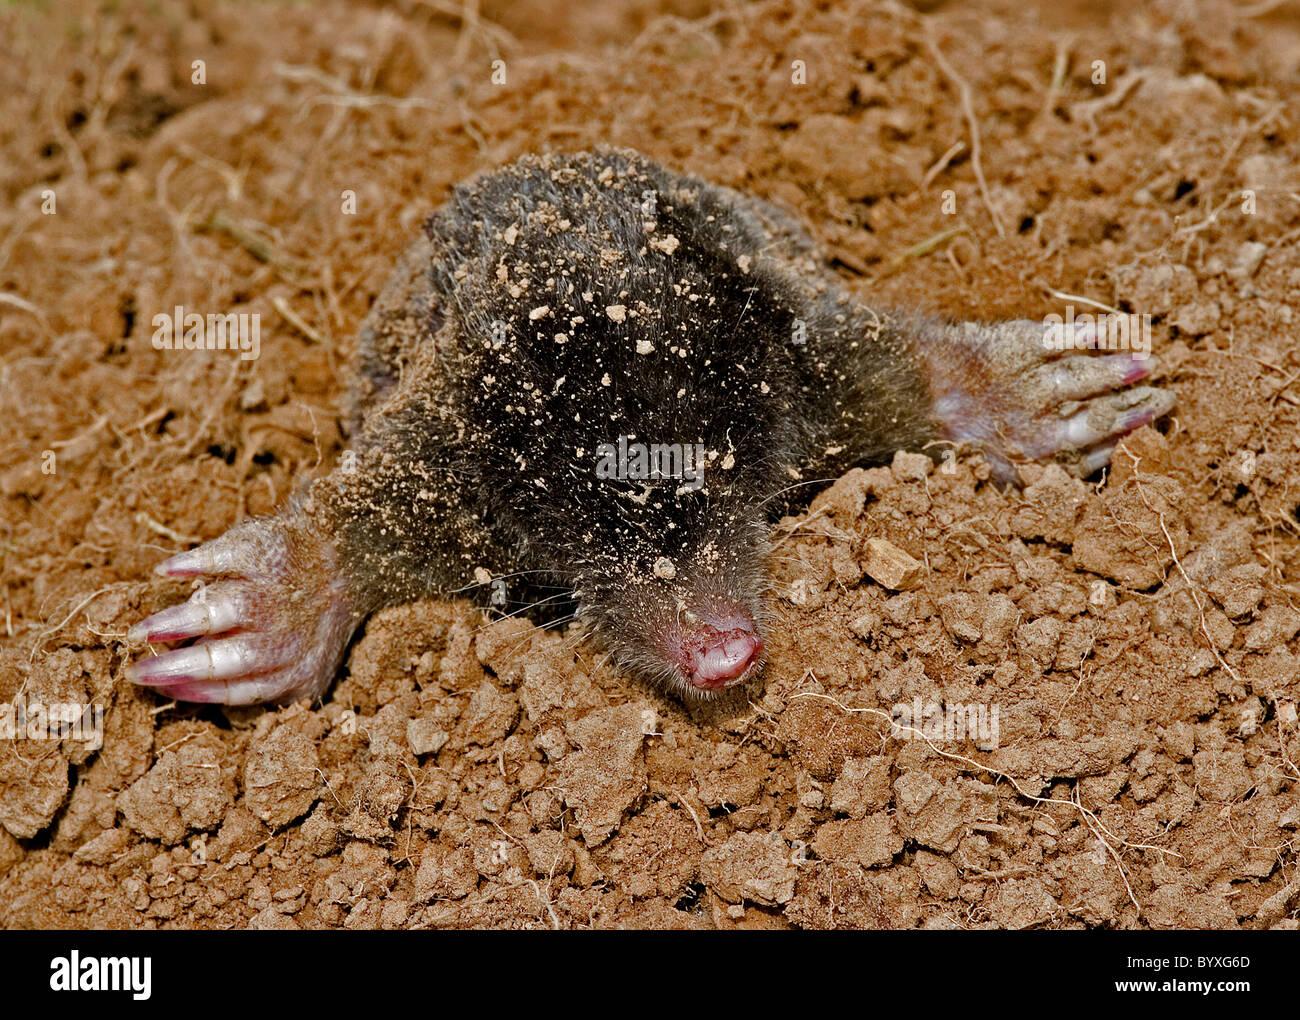 European mole talpa europaea Devon UK - Stock Image